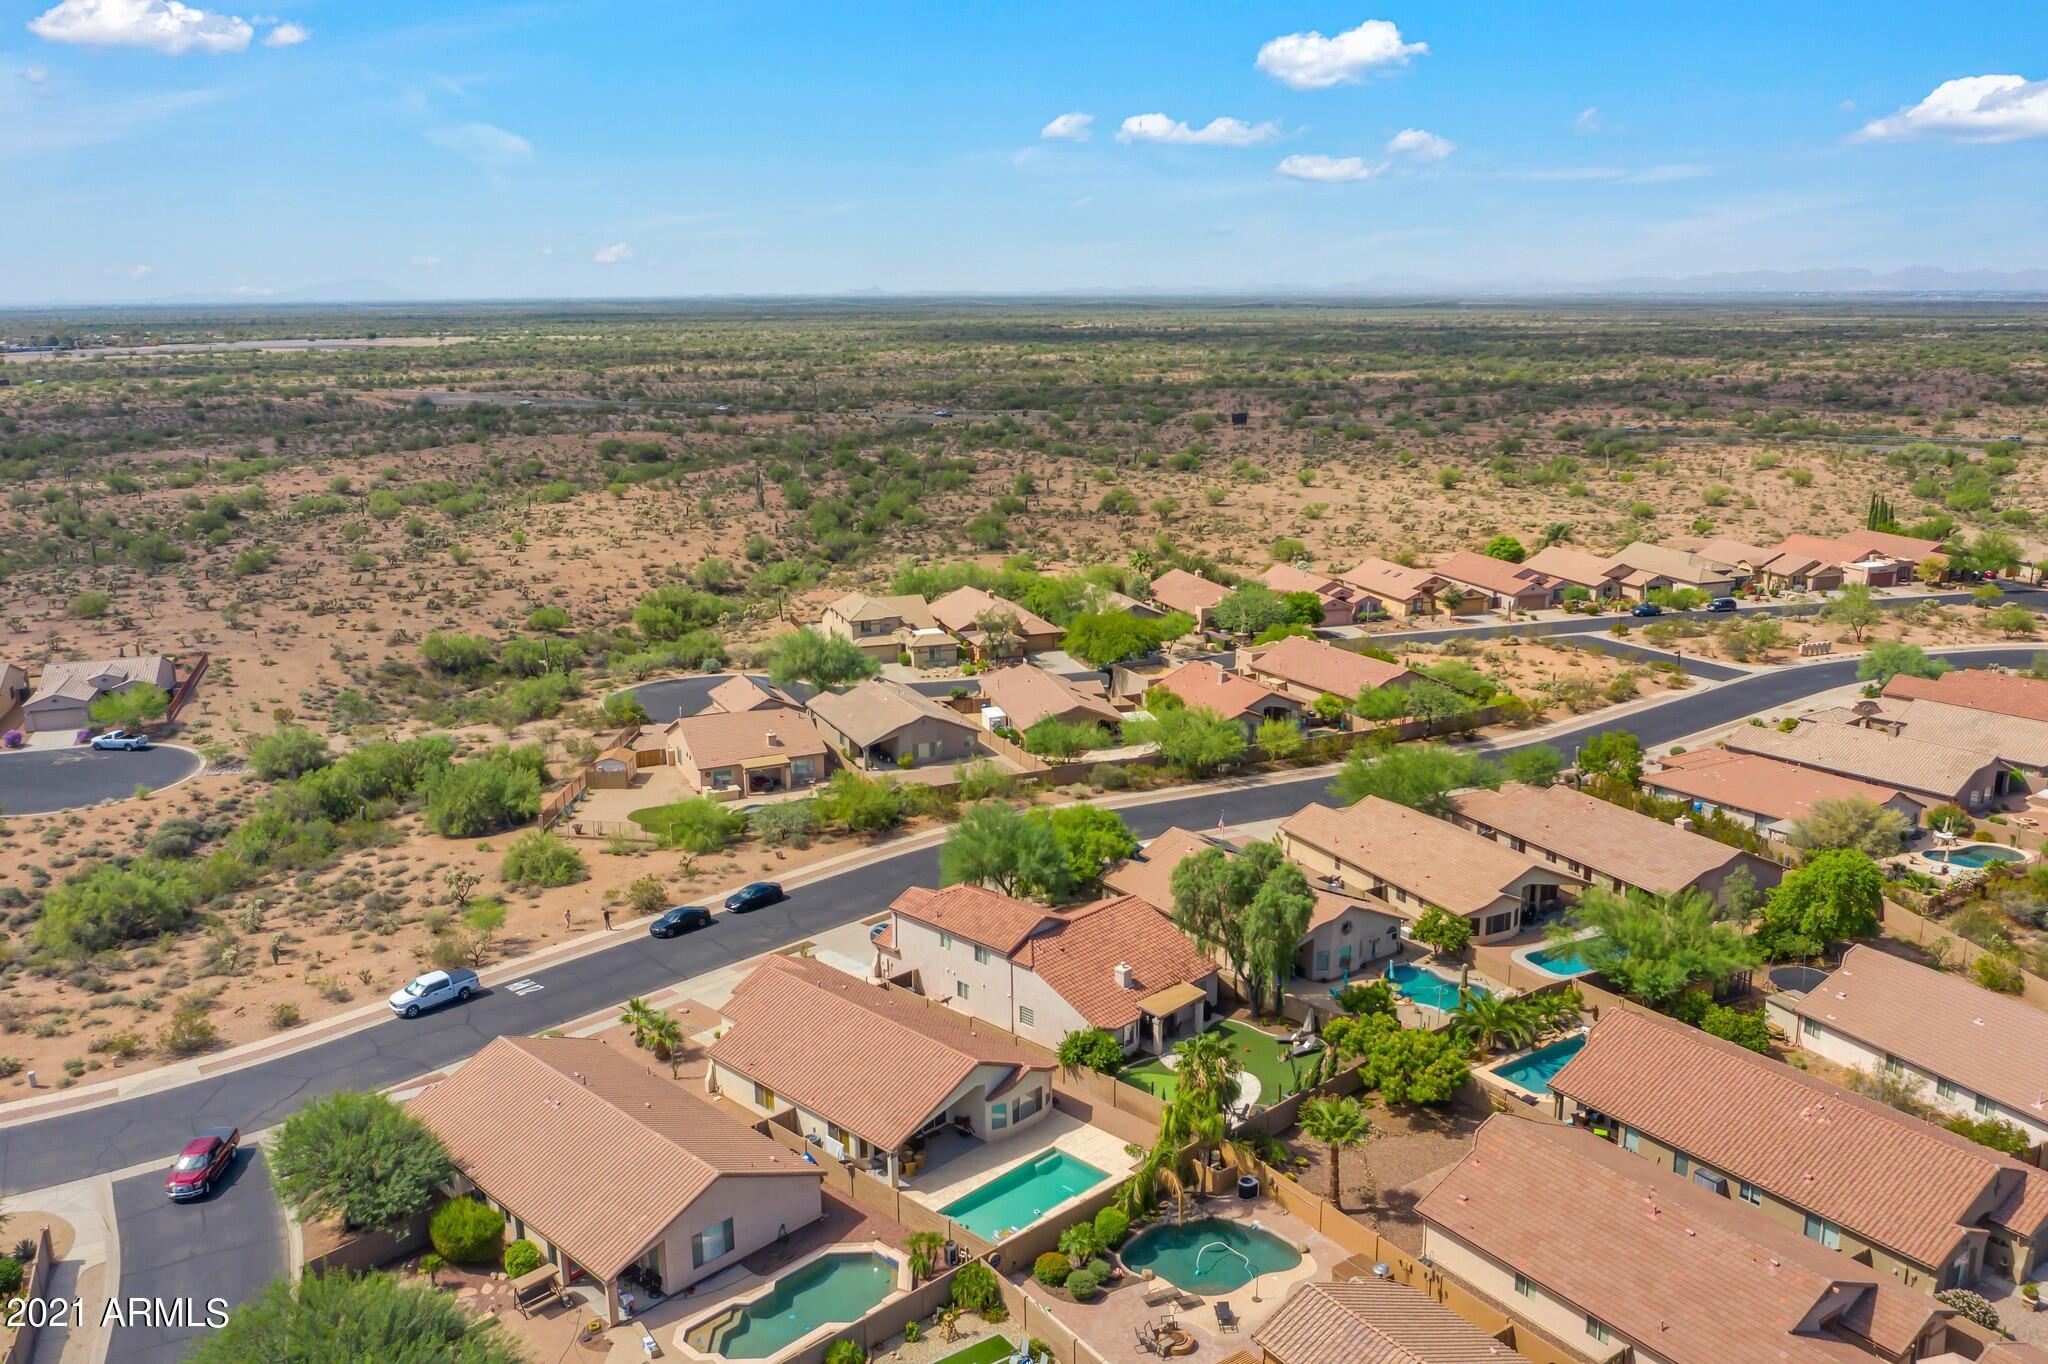 MLS 6270234 10328 E PERALTA CANYON Drive, Gold Canyon, AZ 85118 Gold Canyon AZ Peralta Trails